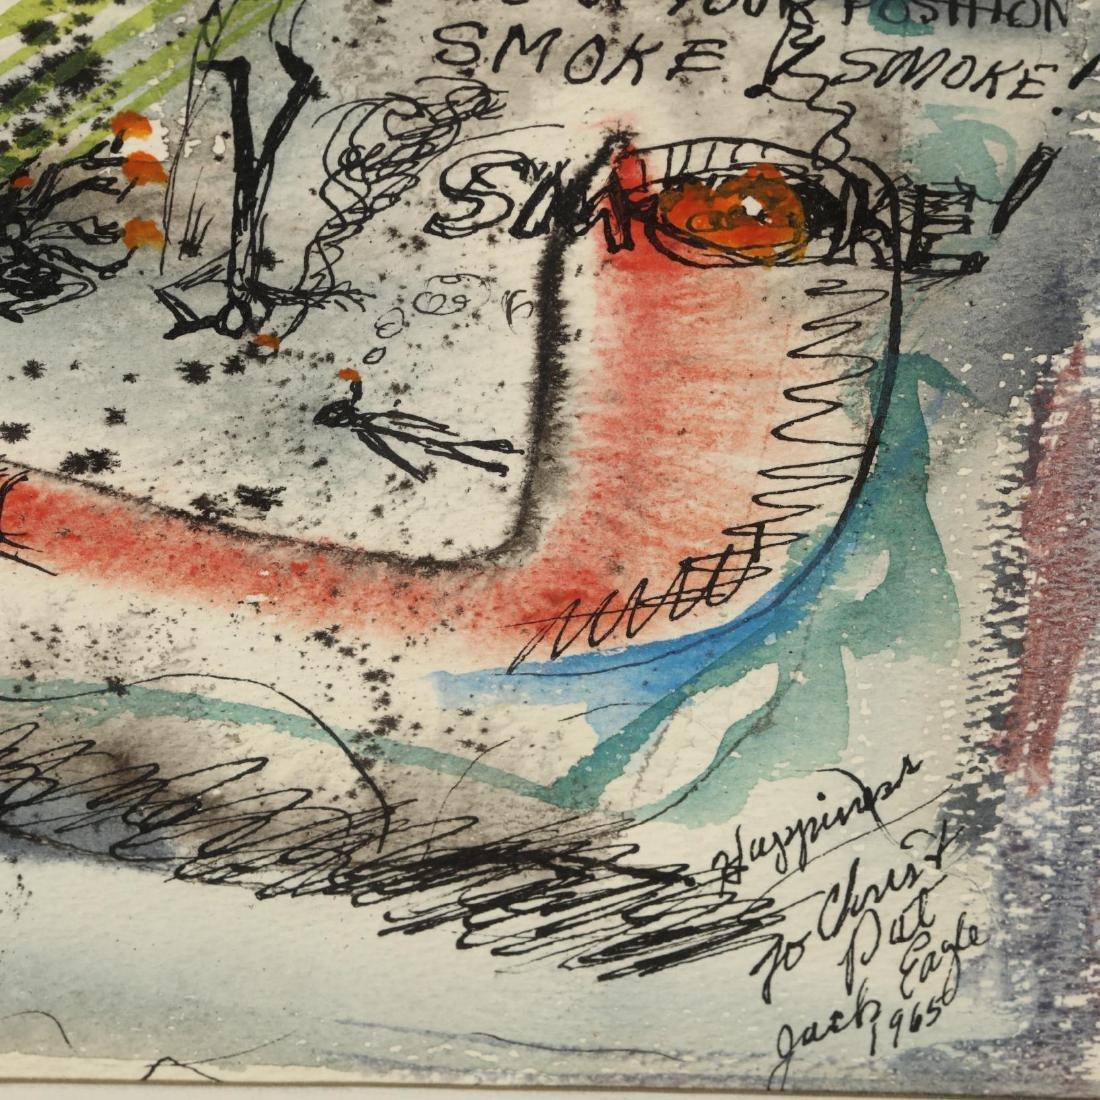 Jack Eagle (PA, 1930-2009), Smoke! - 2